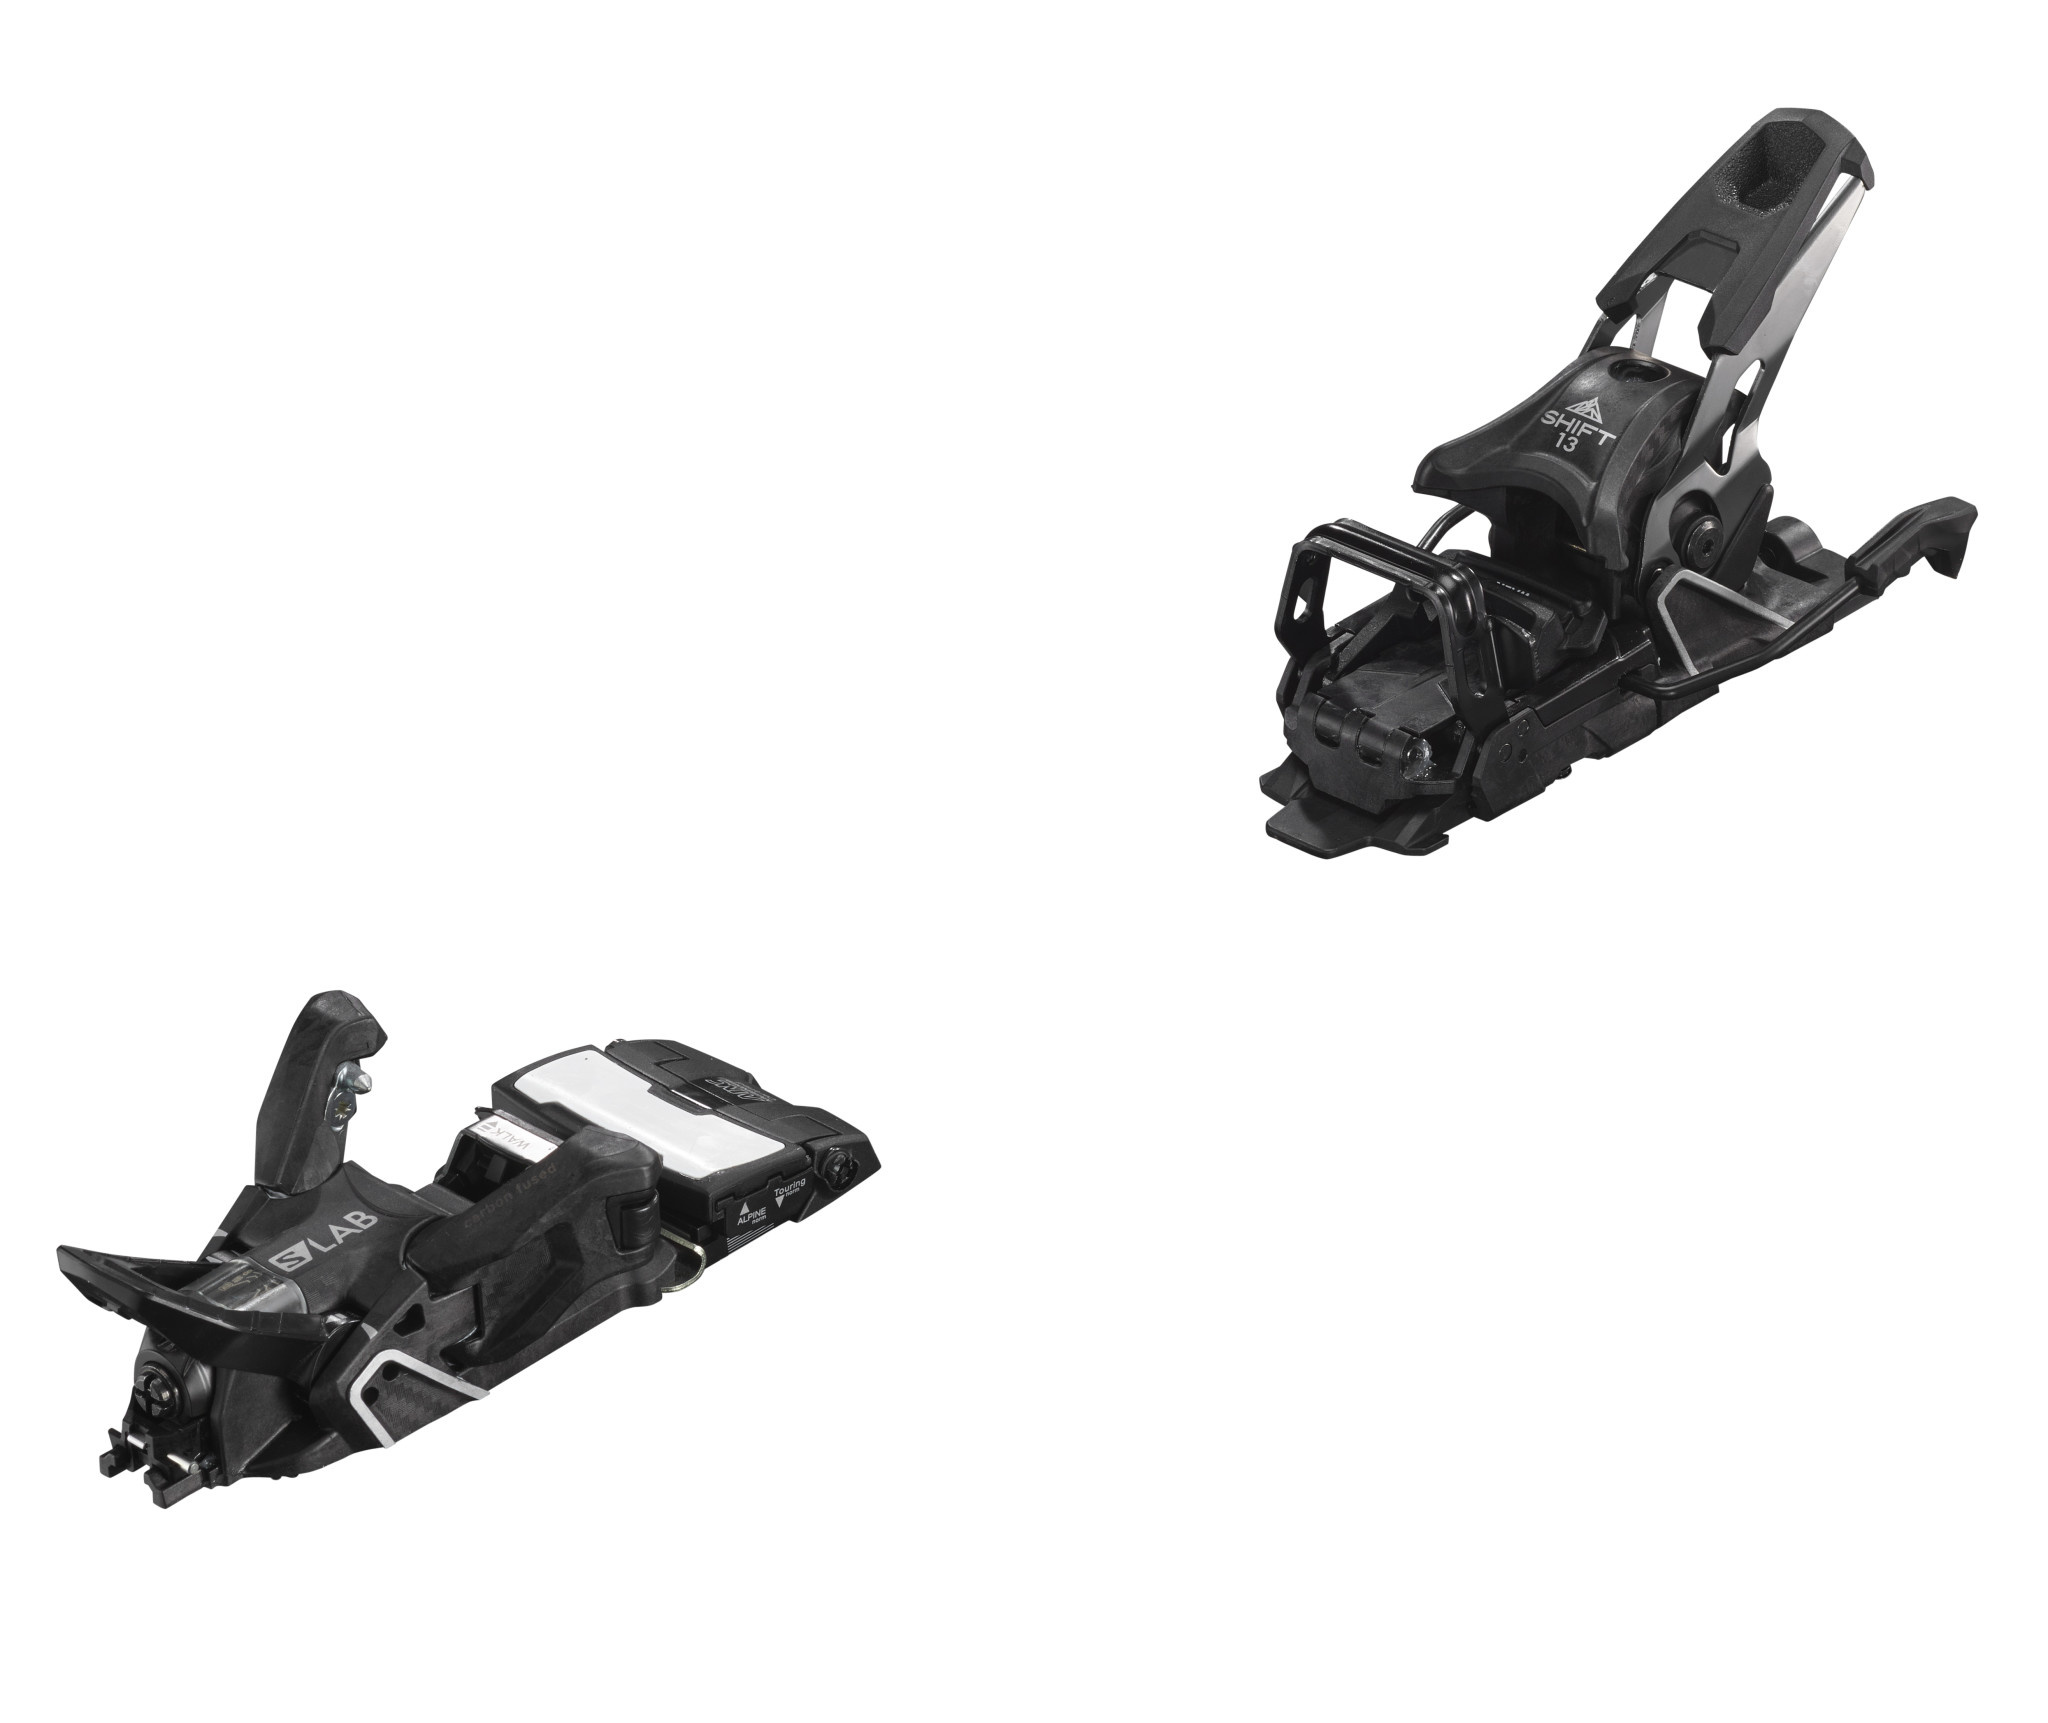 SALOMON Salomon S/Lab Shift MNC 13 Ski Binding (2021)